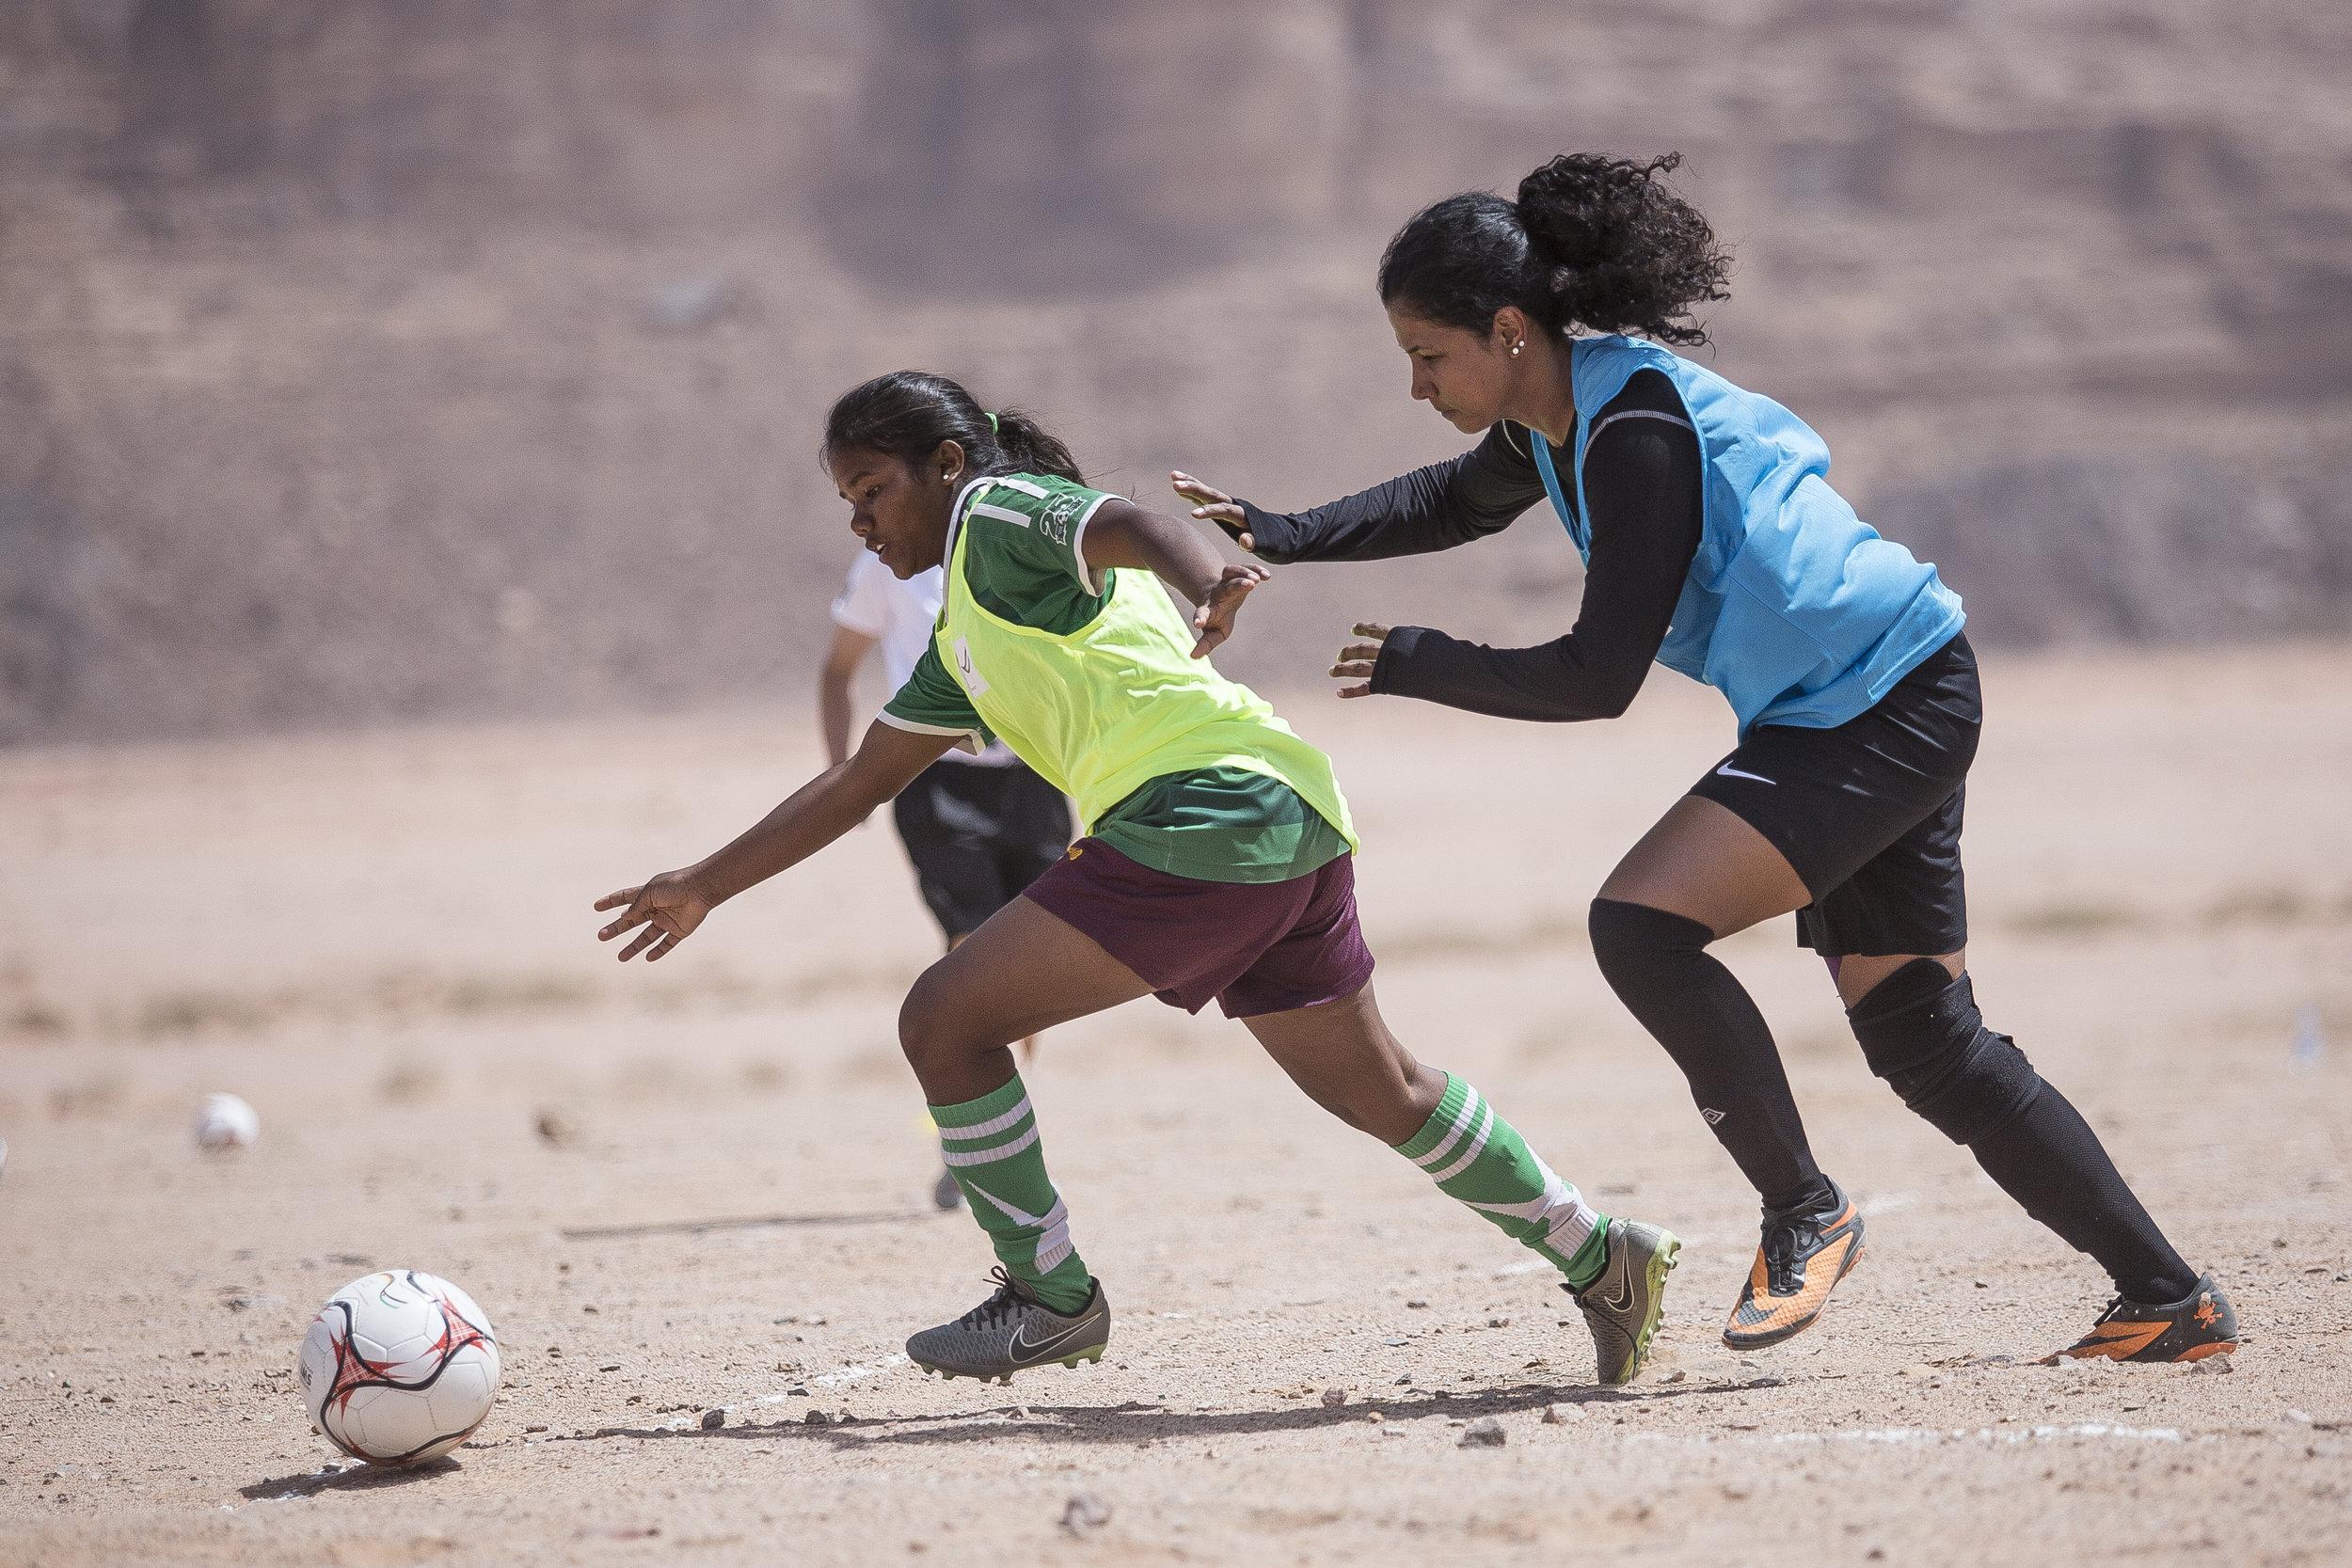 Desert Practice Game @DanaRoesiger (2).jpg